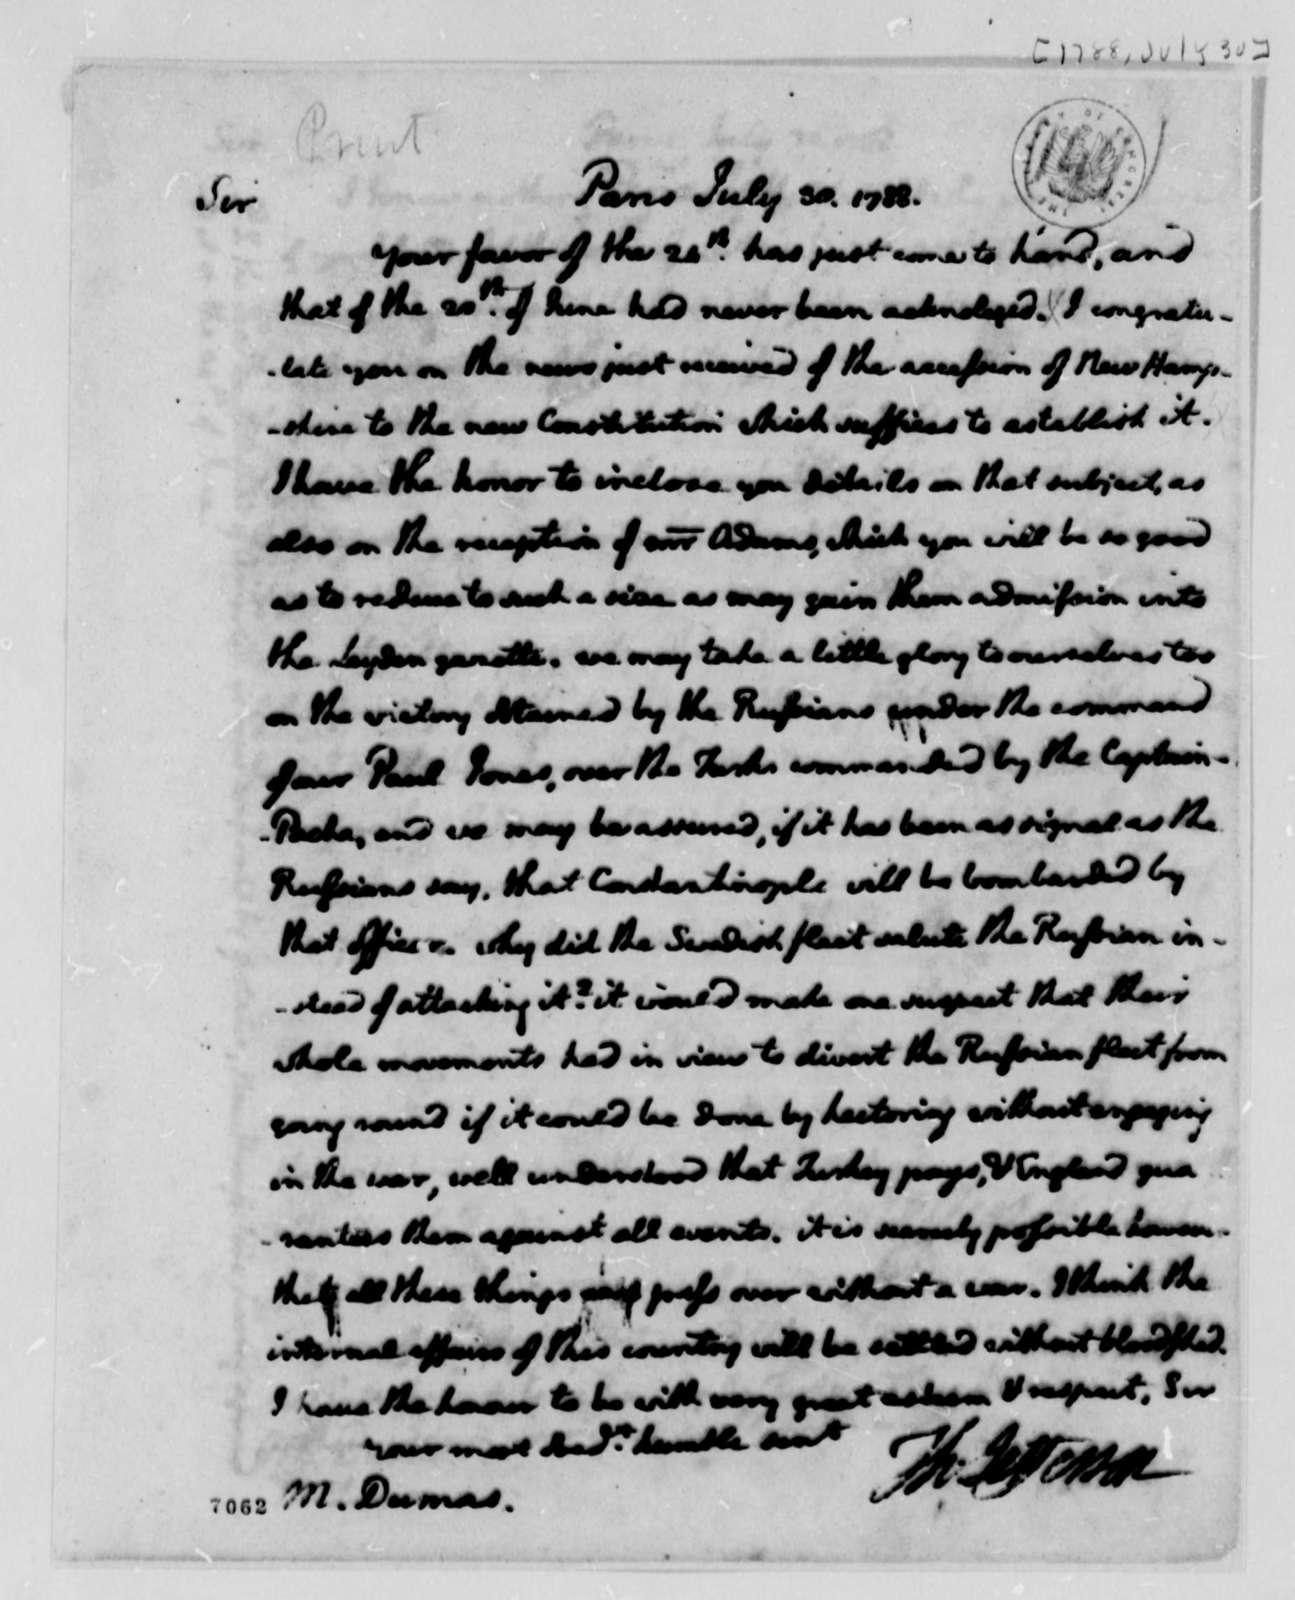 Thomas Jefferson to Charles William Frederic Dumas, July 30, 1788